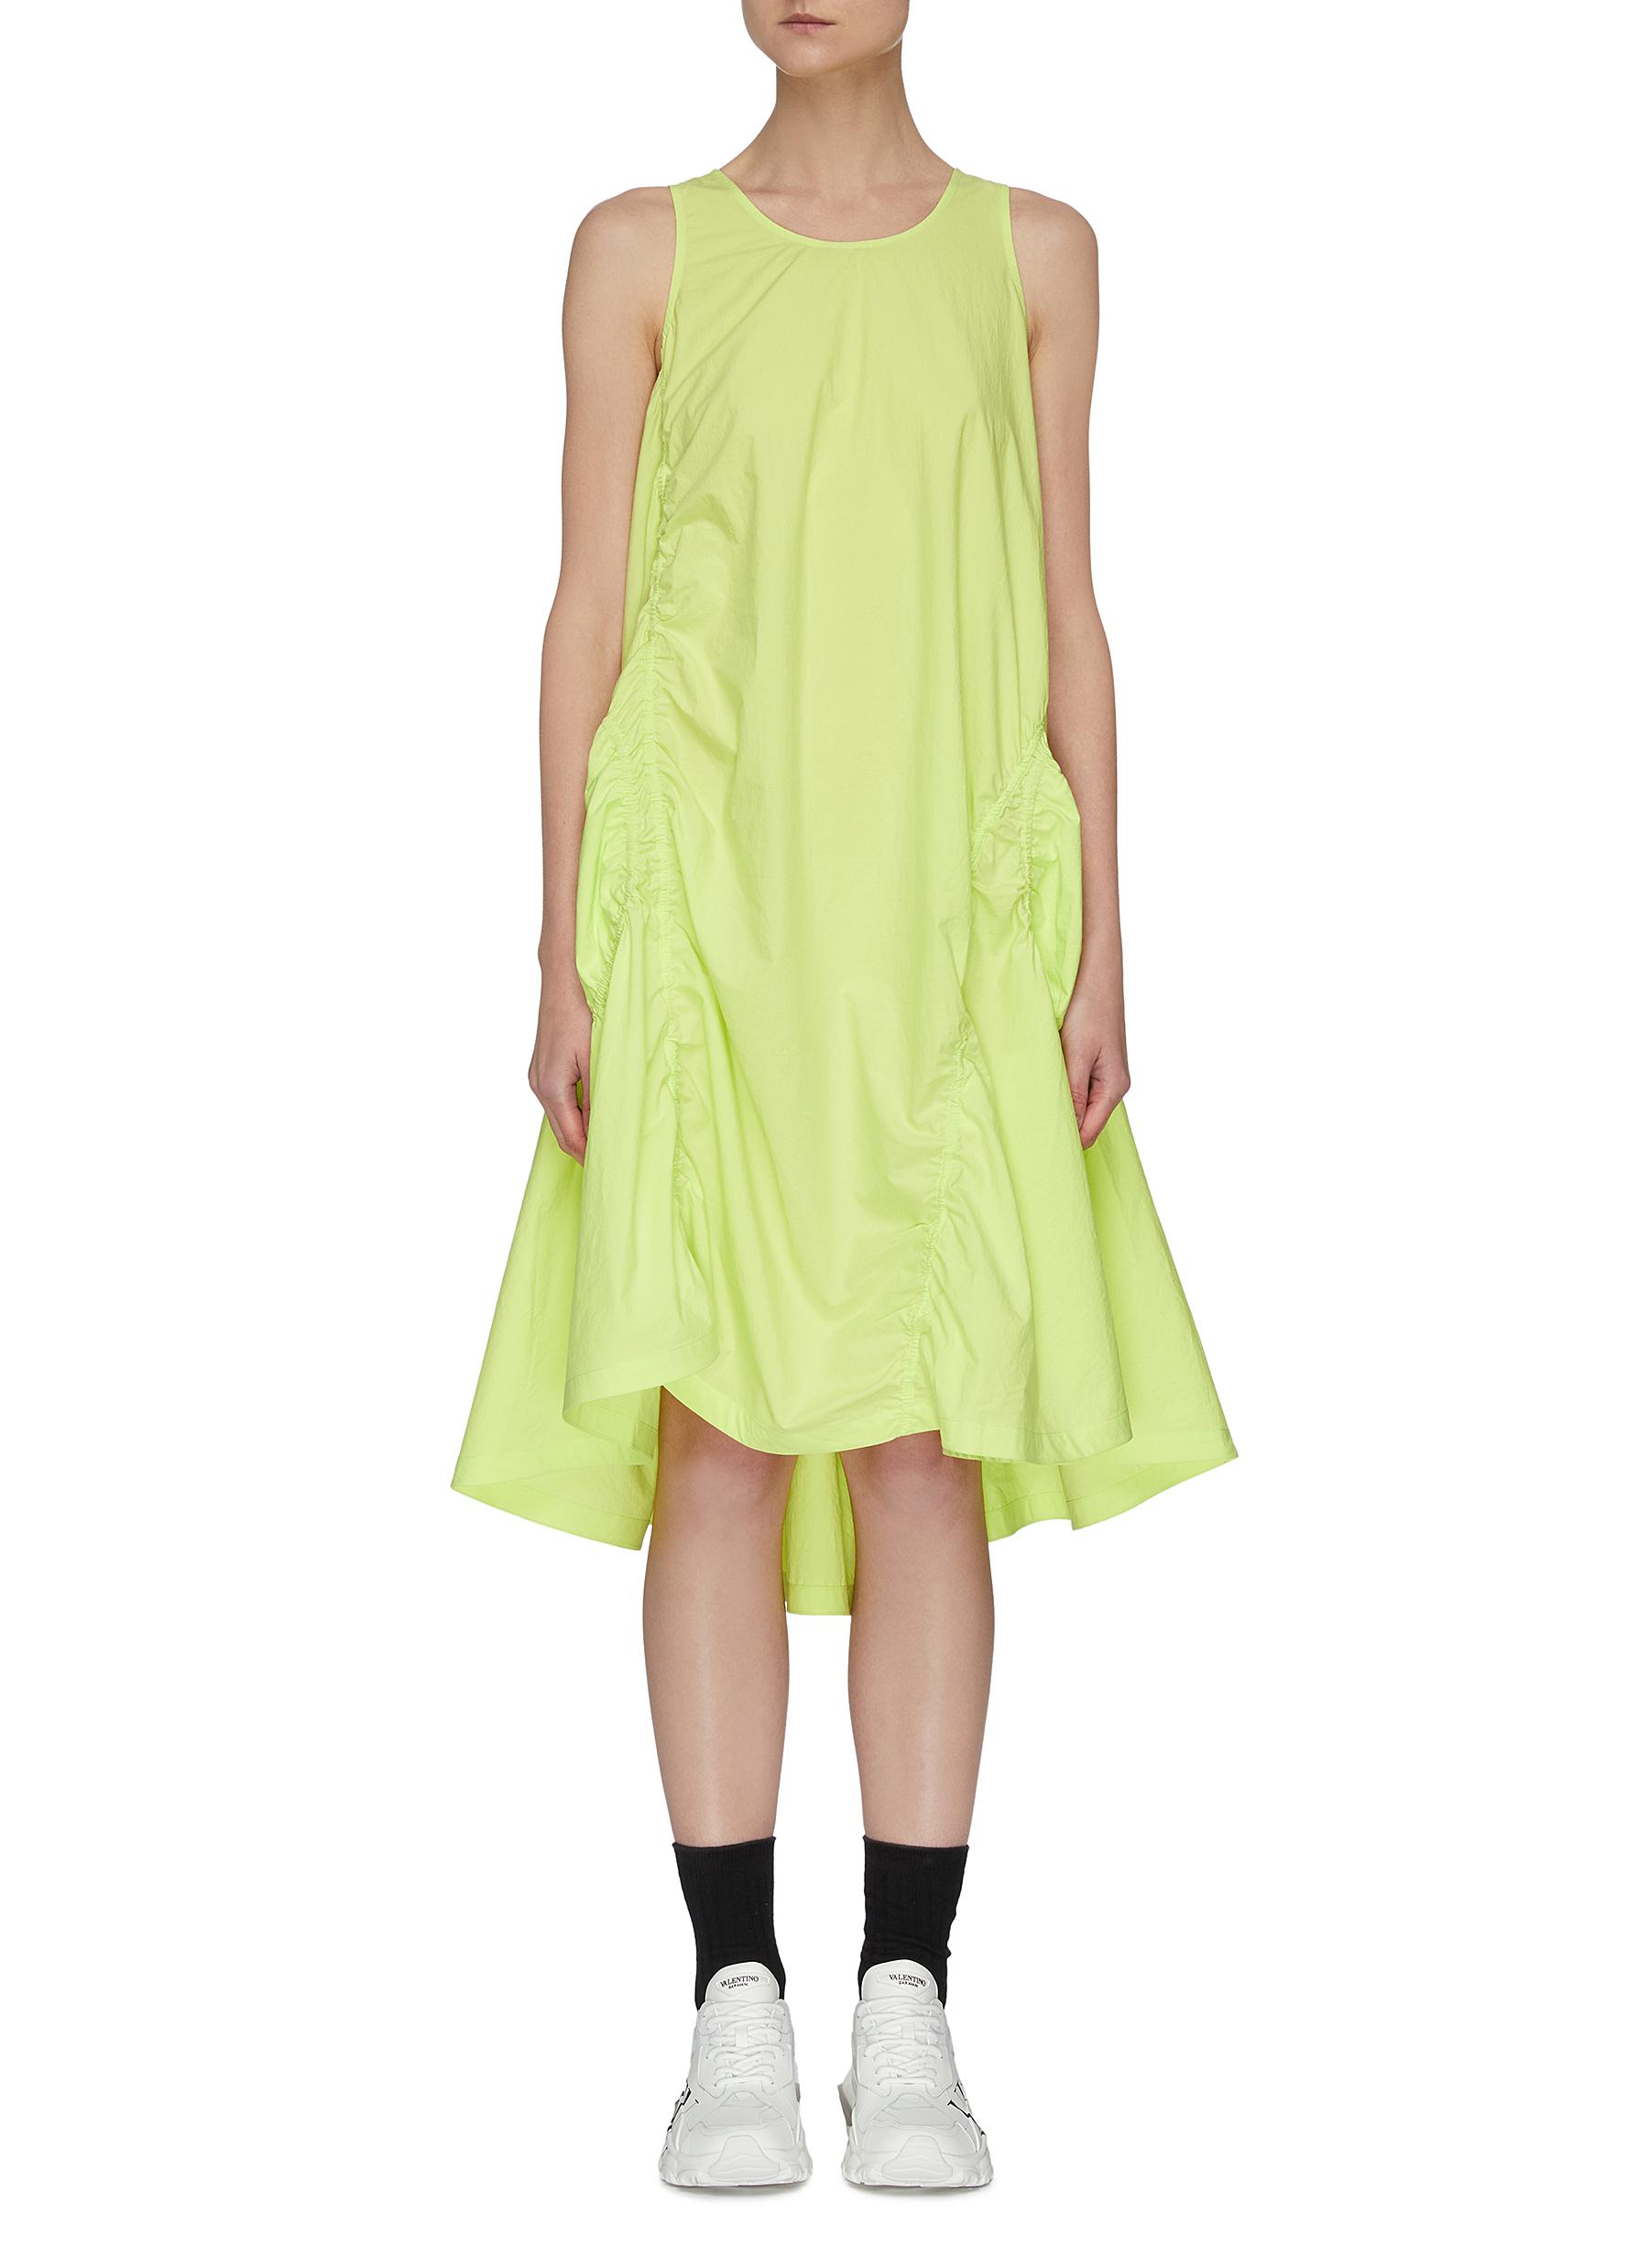 Buy Angel Chen Dresses Elastic Detail Cut Out Back Dress